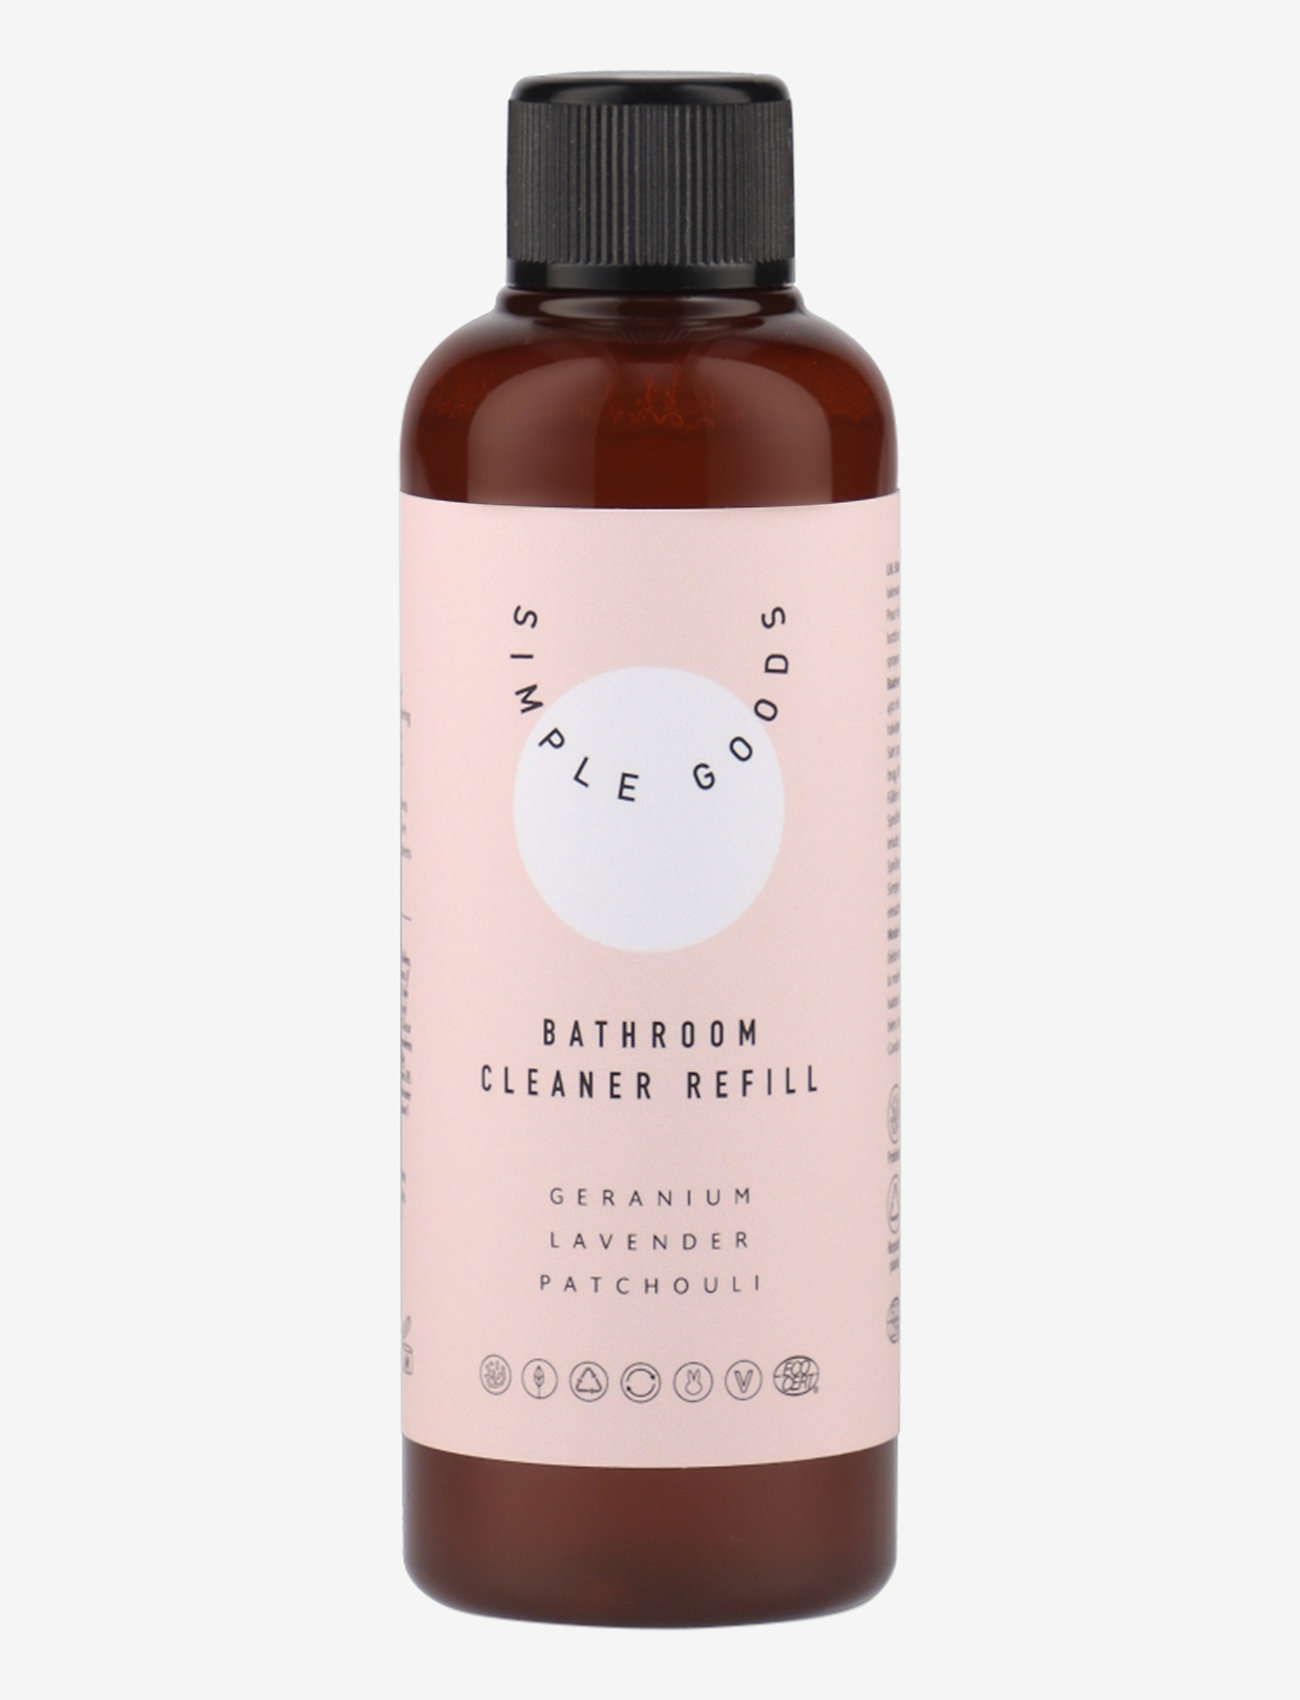 Simple Goods - Refill Bathroom Cleaner, Geranium, Lavender, Patchouli - Övrigt diskning & städning - clear - 0